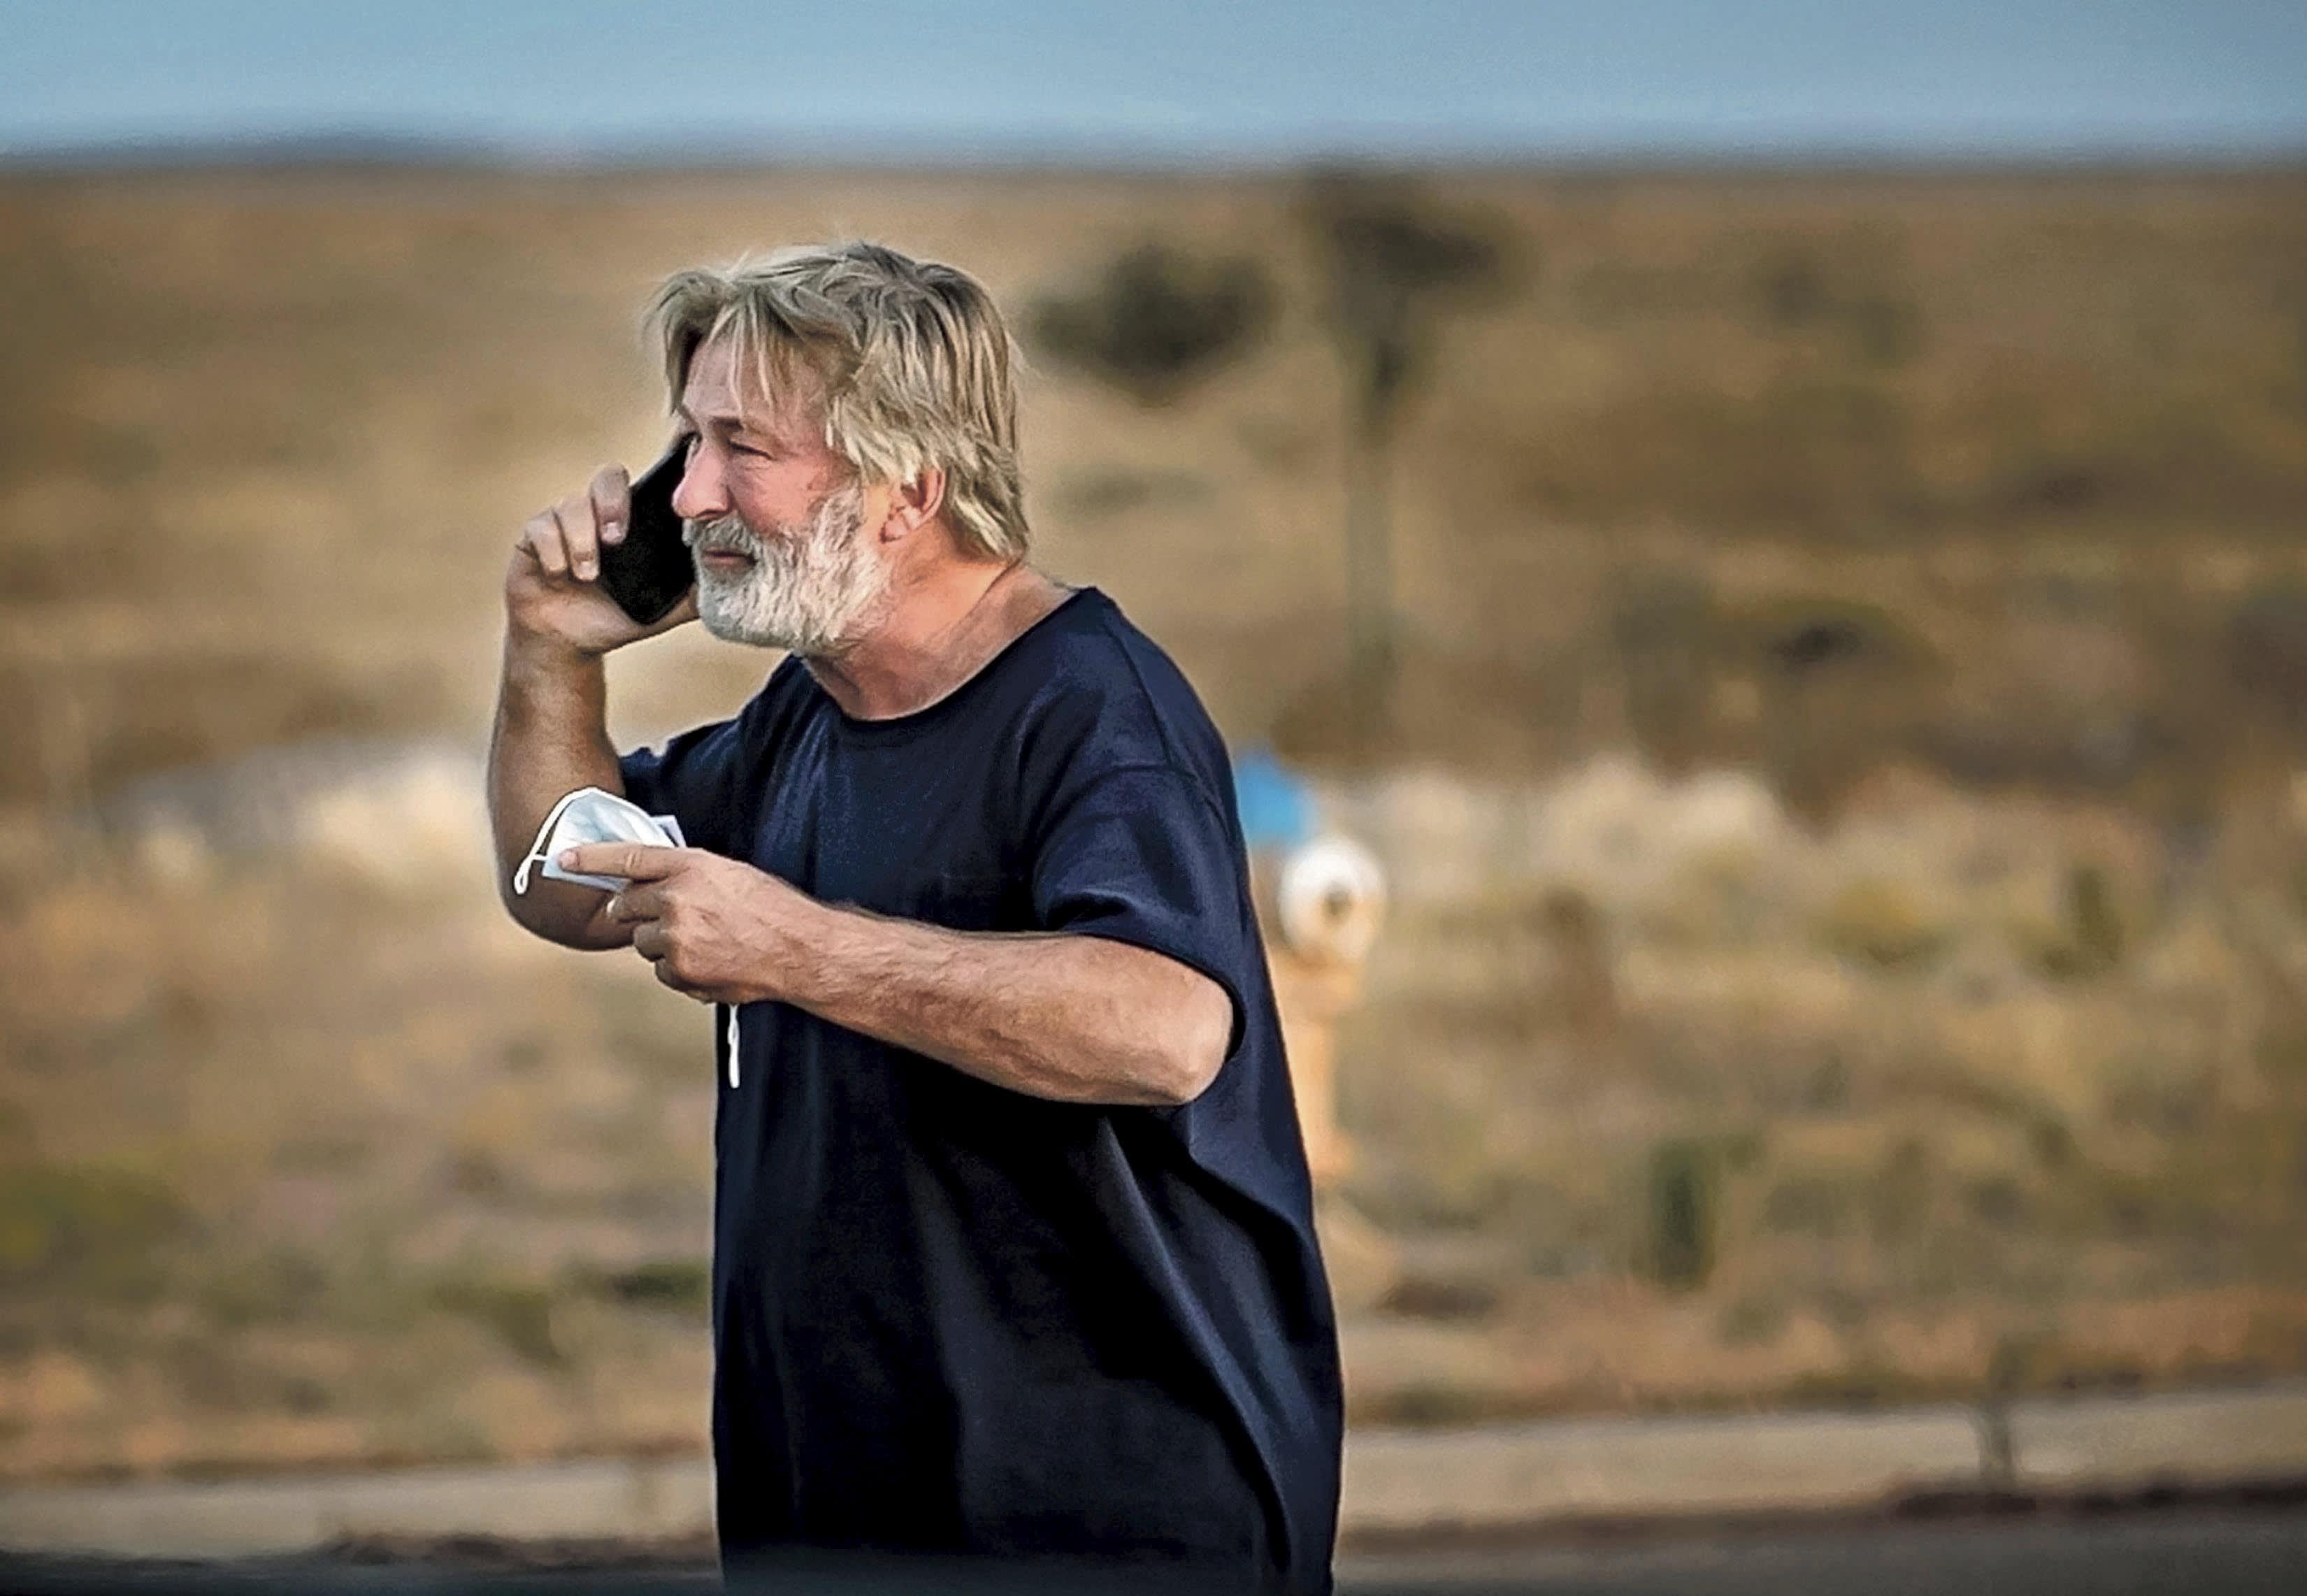 Alec Baldwin says 'my heart is broken' after prop gun he fired kills cinematographer on movie set thumbnail